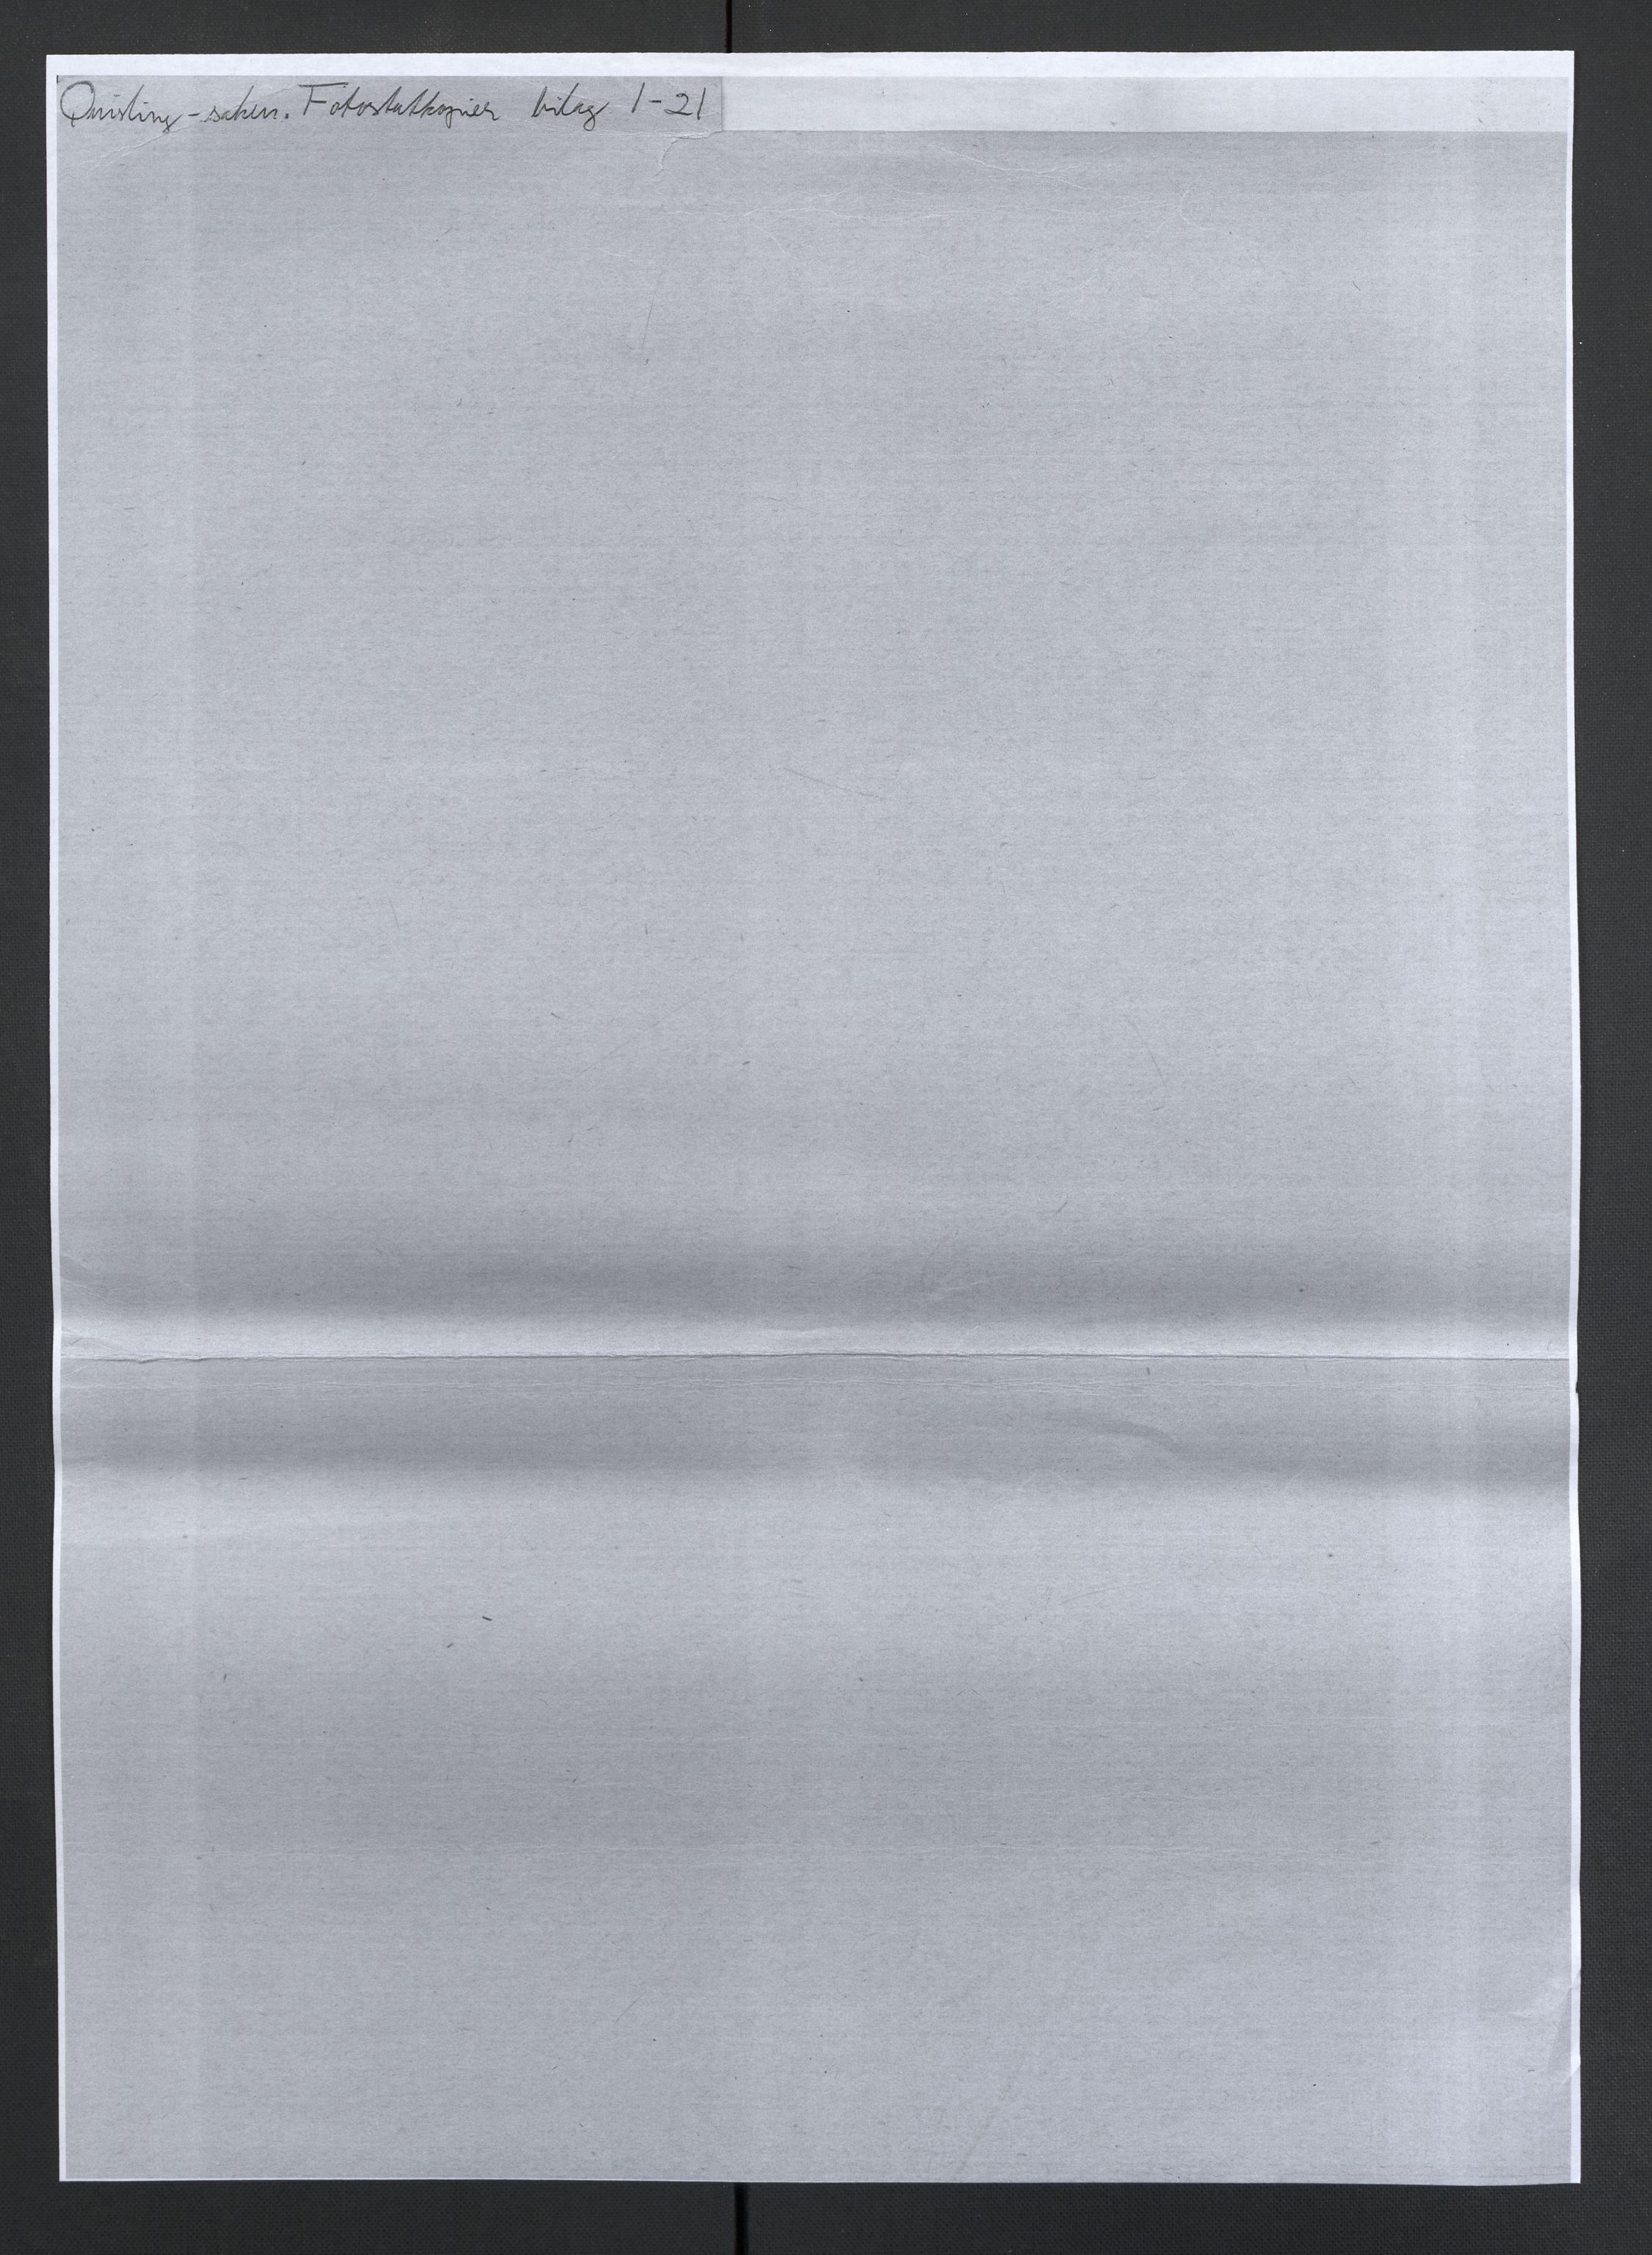 RA, Landssvikarkivet, D/Da/L0006: Dnr. 29, 1945, s. 2